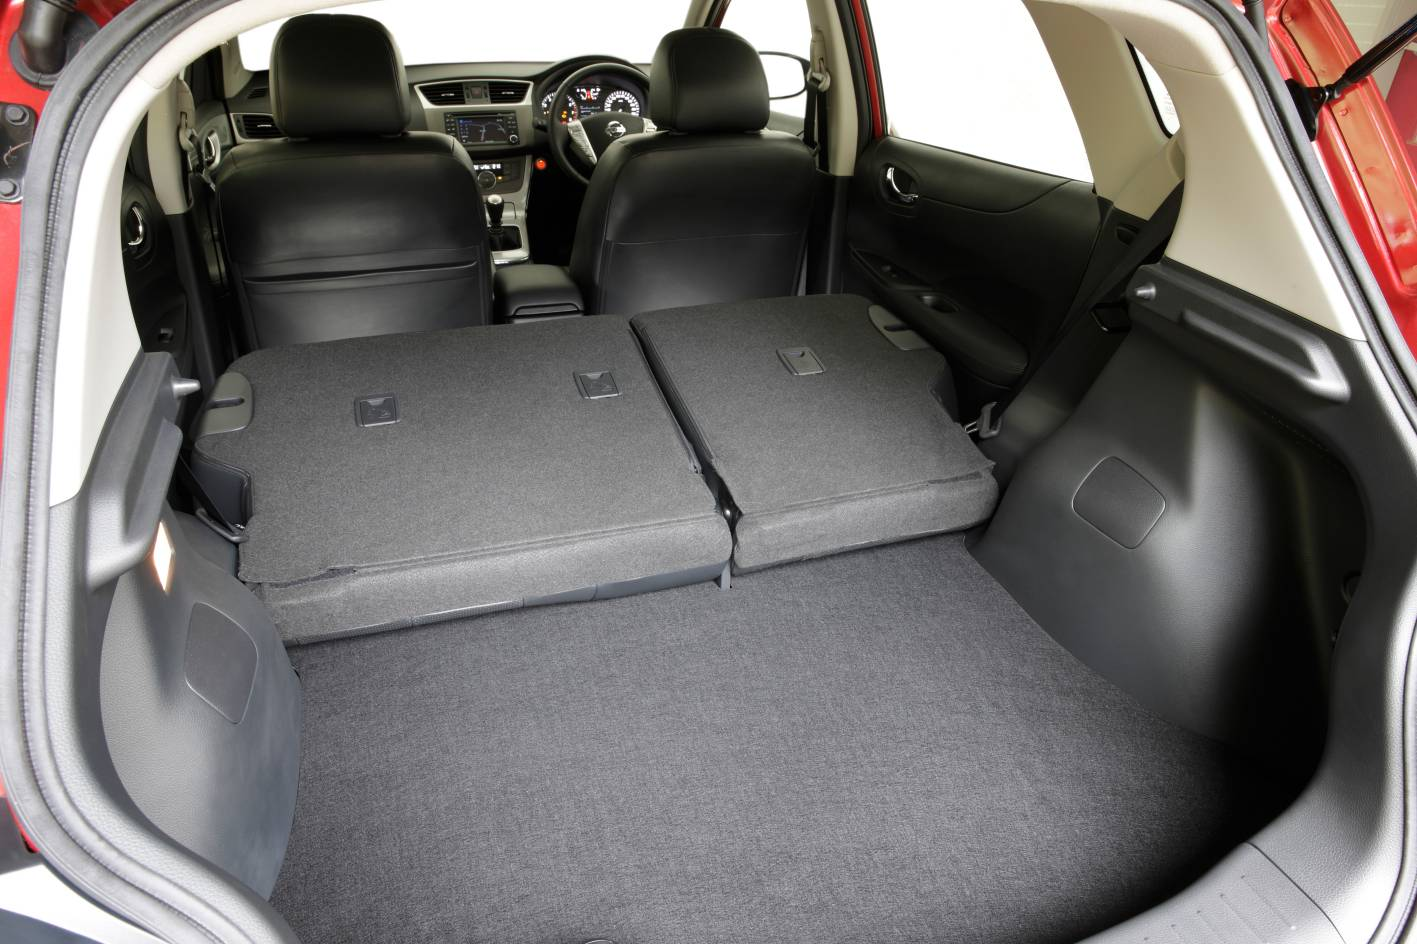 2013 Nissan Pulsar Sss Hatch Boot Space